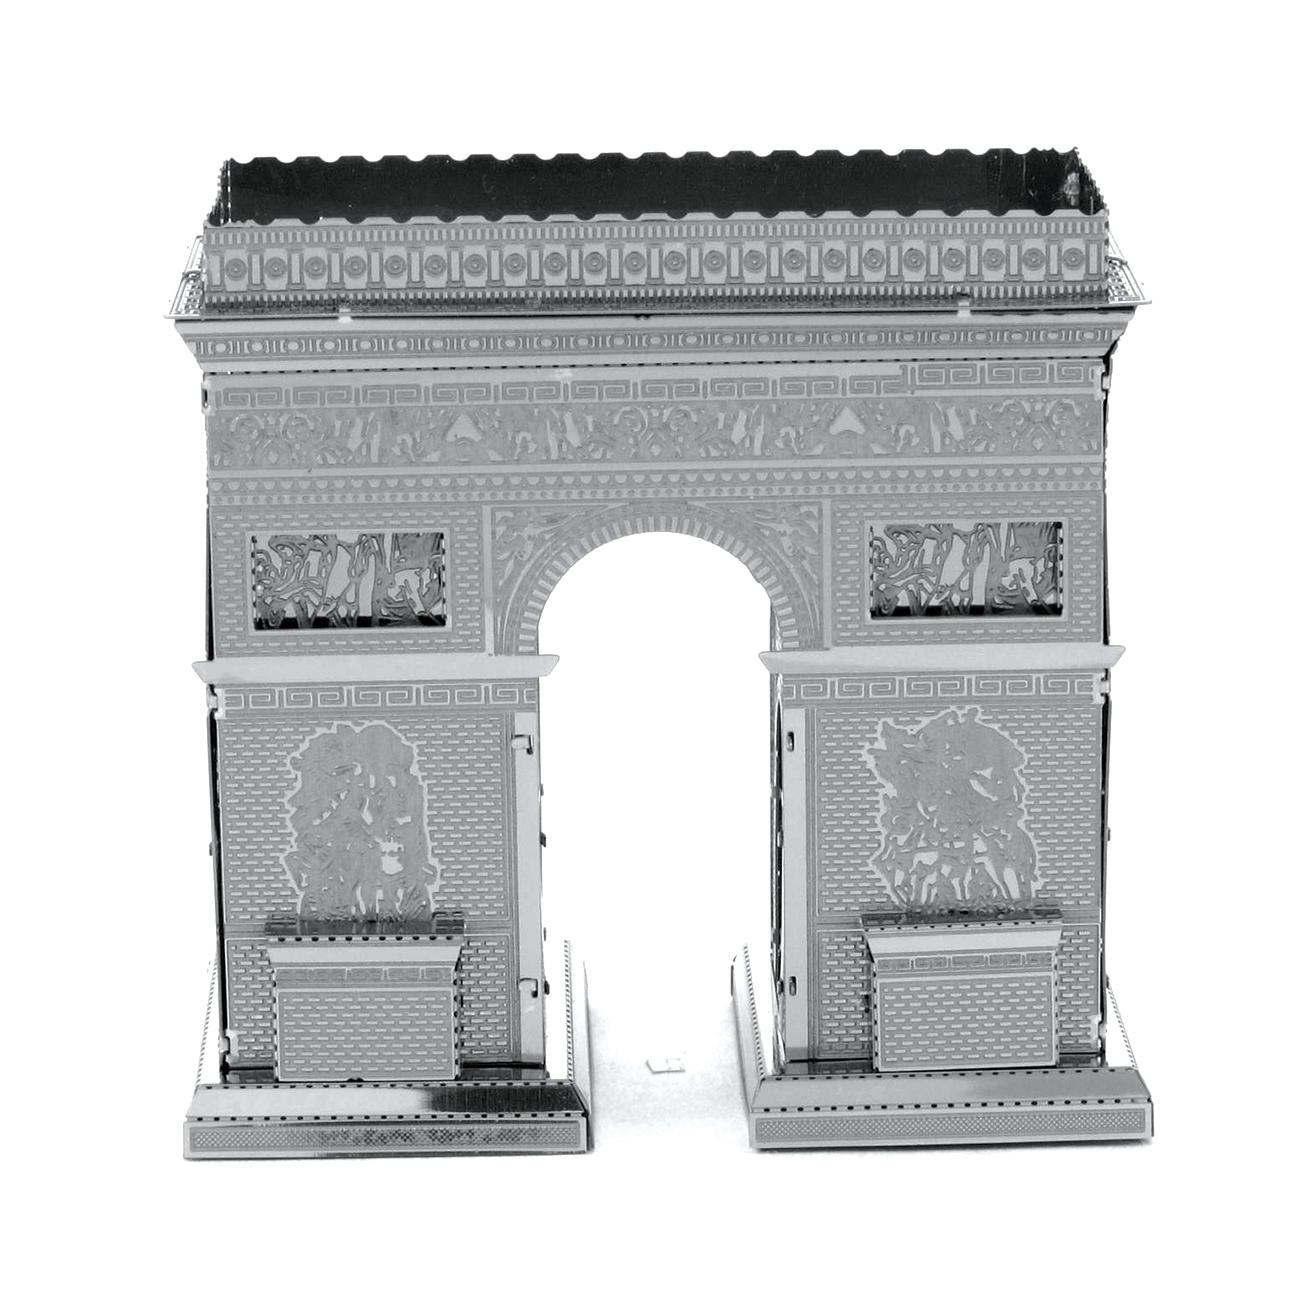 3d jigsaw puzzle arc de triomphe metal earth mms023 30 pieces jigsaw puzzles monuments. Black Bedroom Furniture Sets. Home Design Ideas